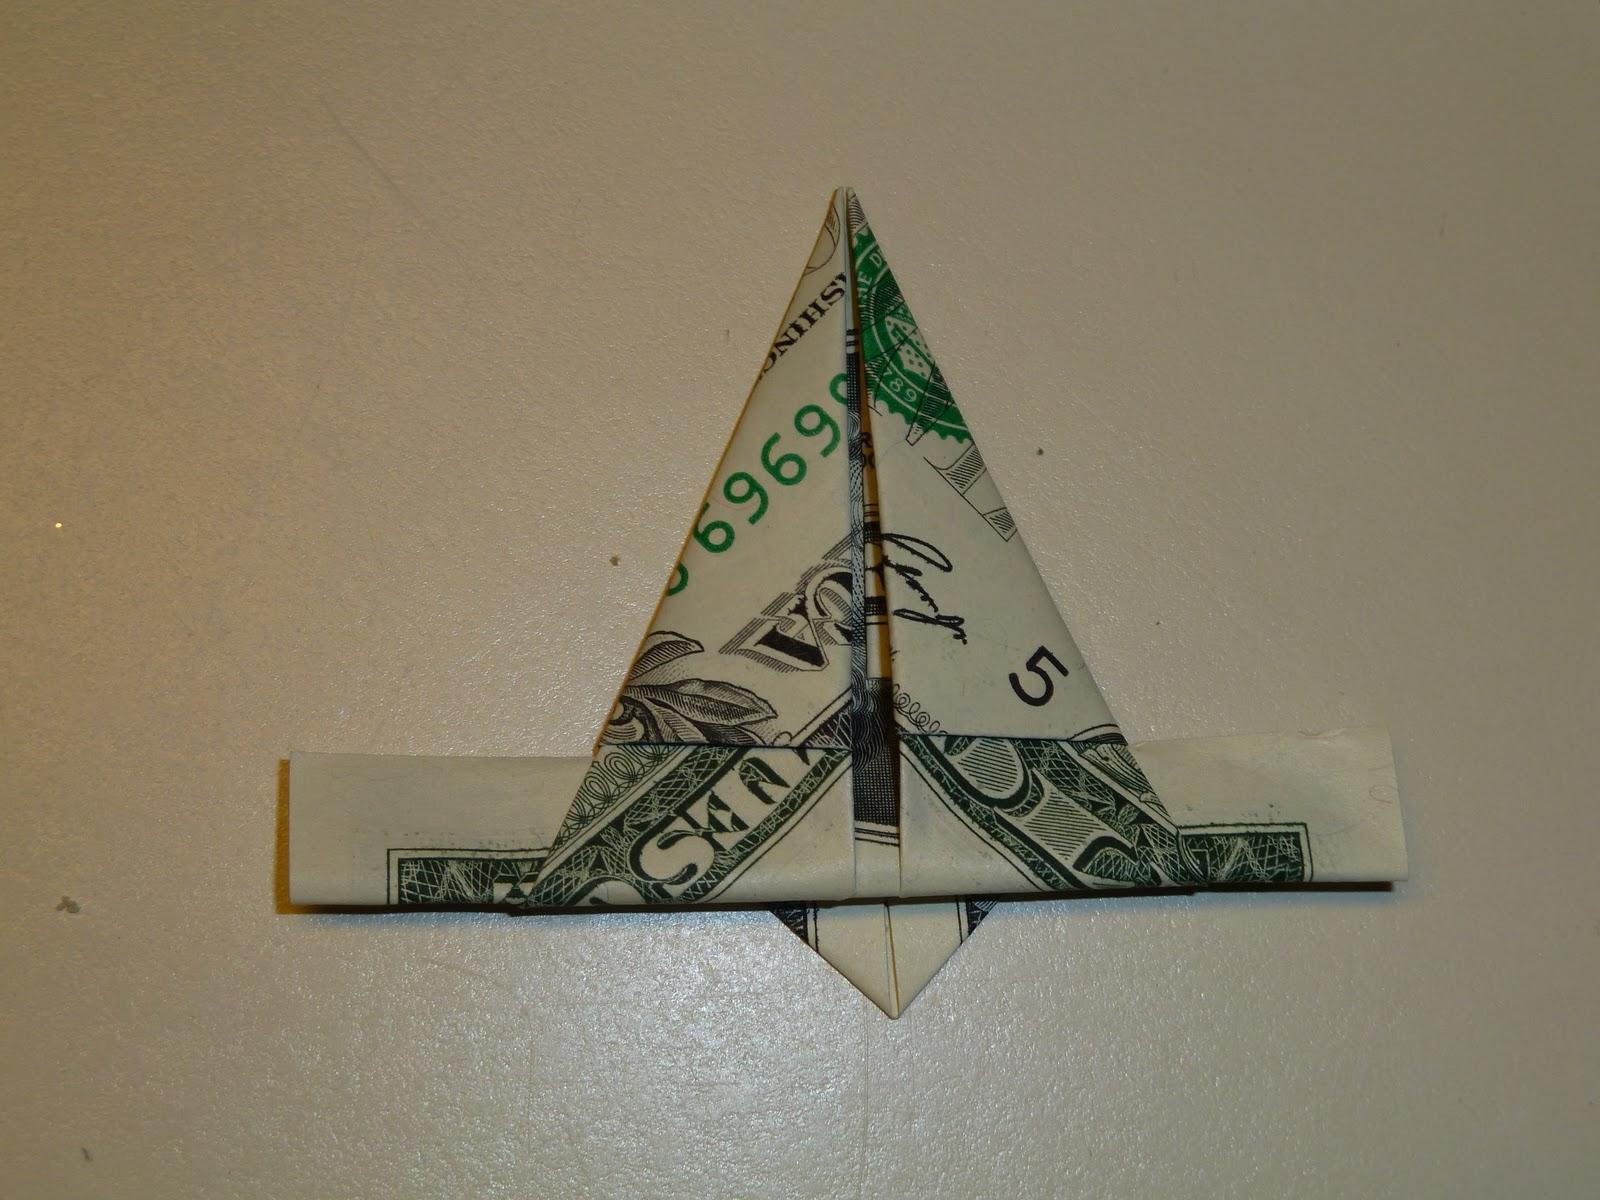 Origami 5 pointed star choice image craft decoration ideas make it easy crafts easy money folded five pointed origami star back of point jeuxipadfo choice jeuxipadfo Images